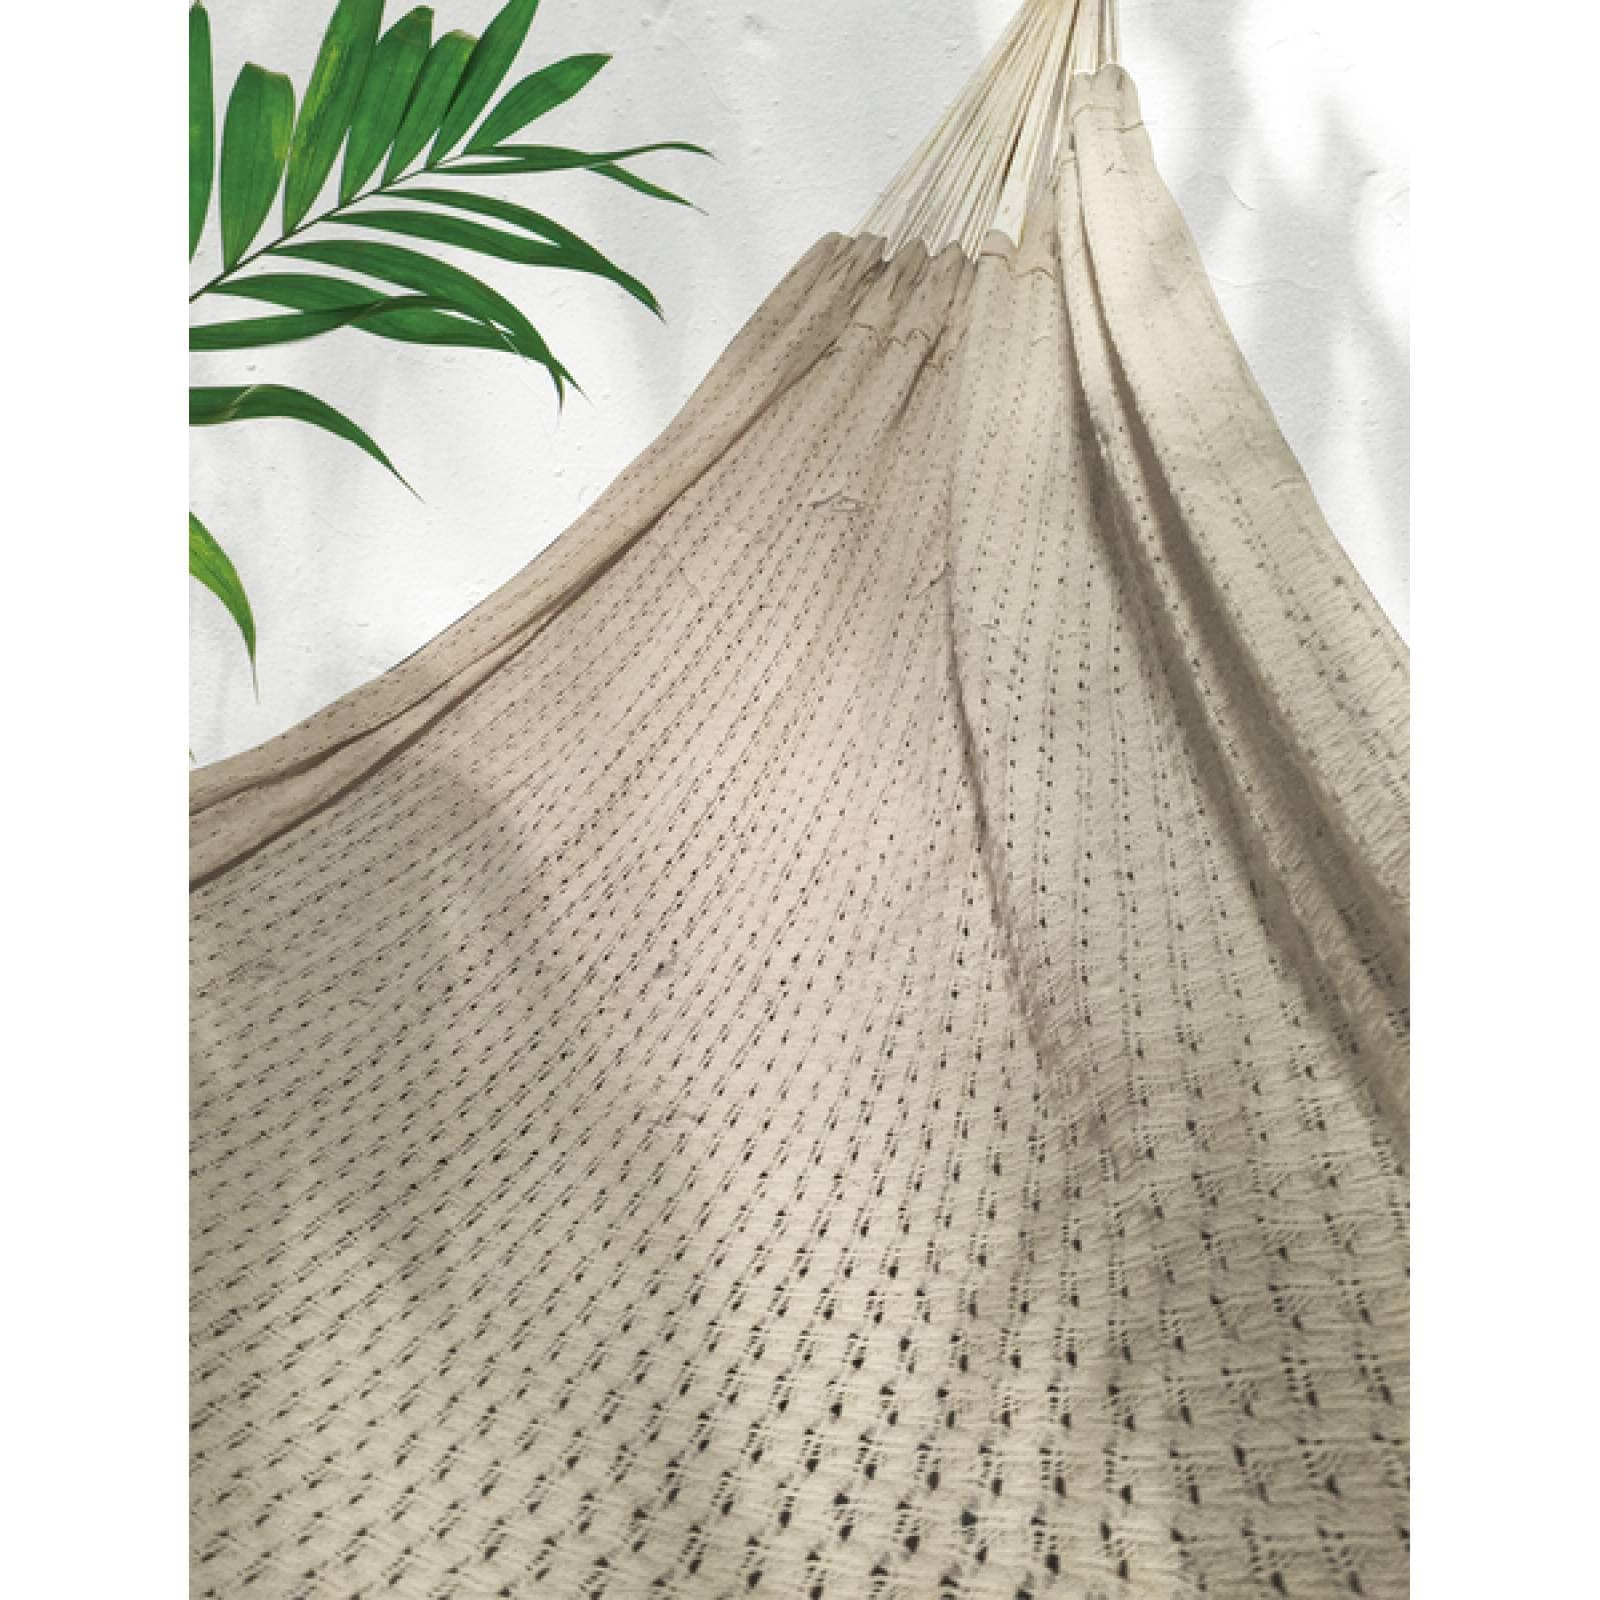 Hamaca Cotton 100% Artesanal Maya Premium